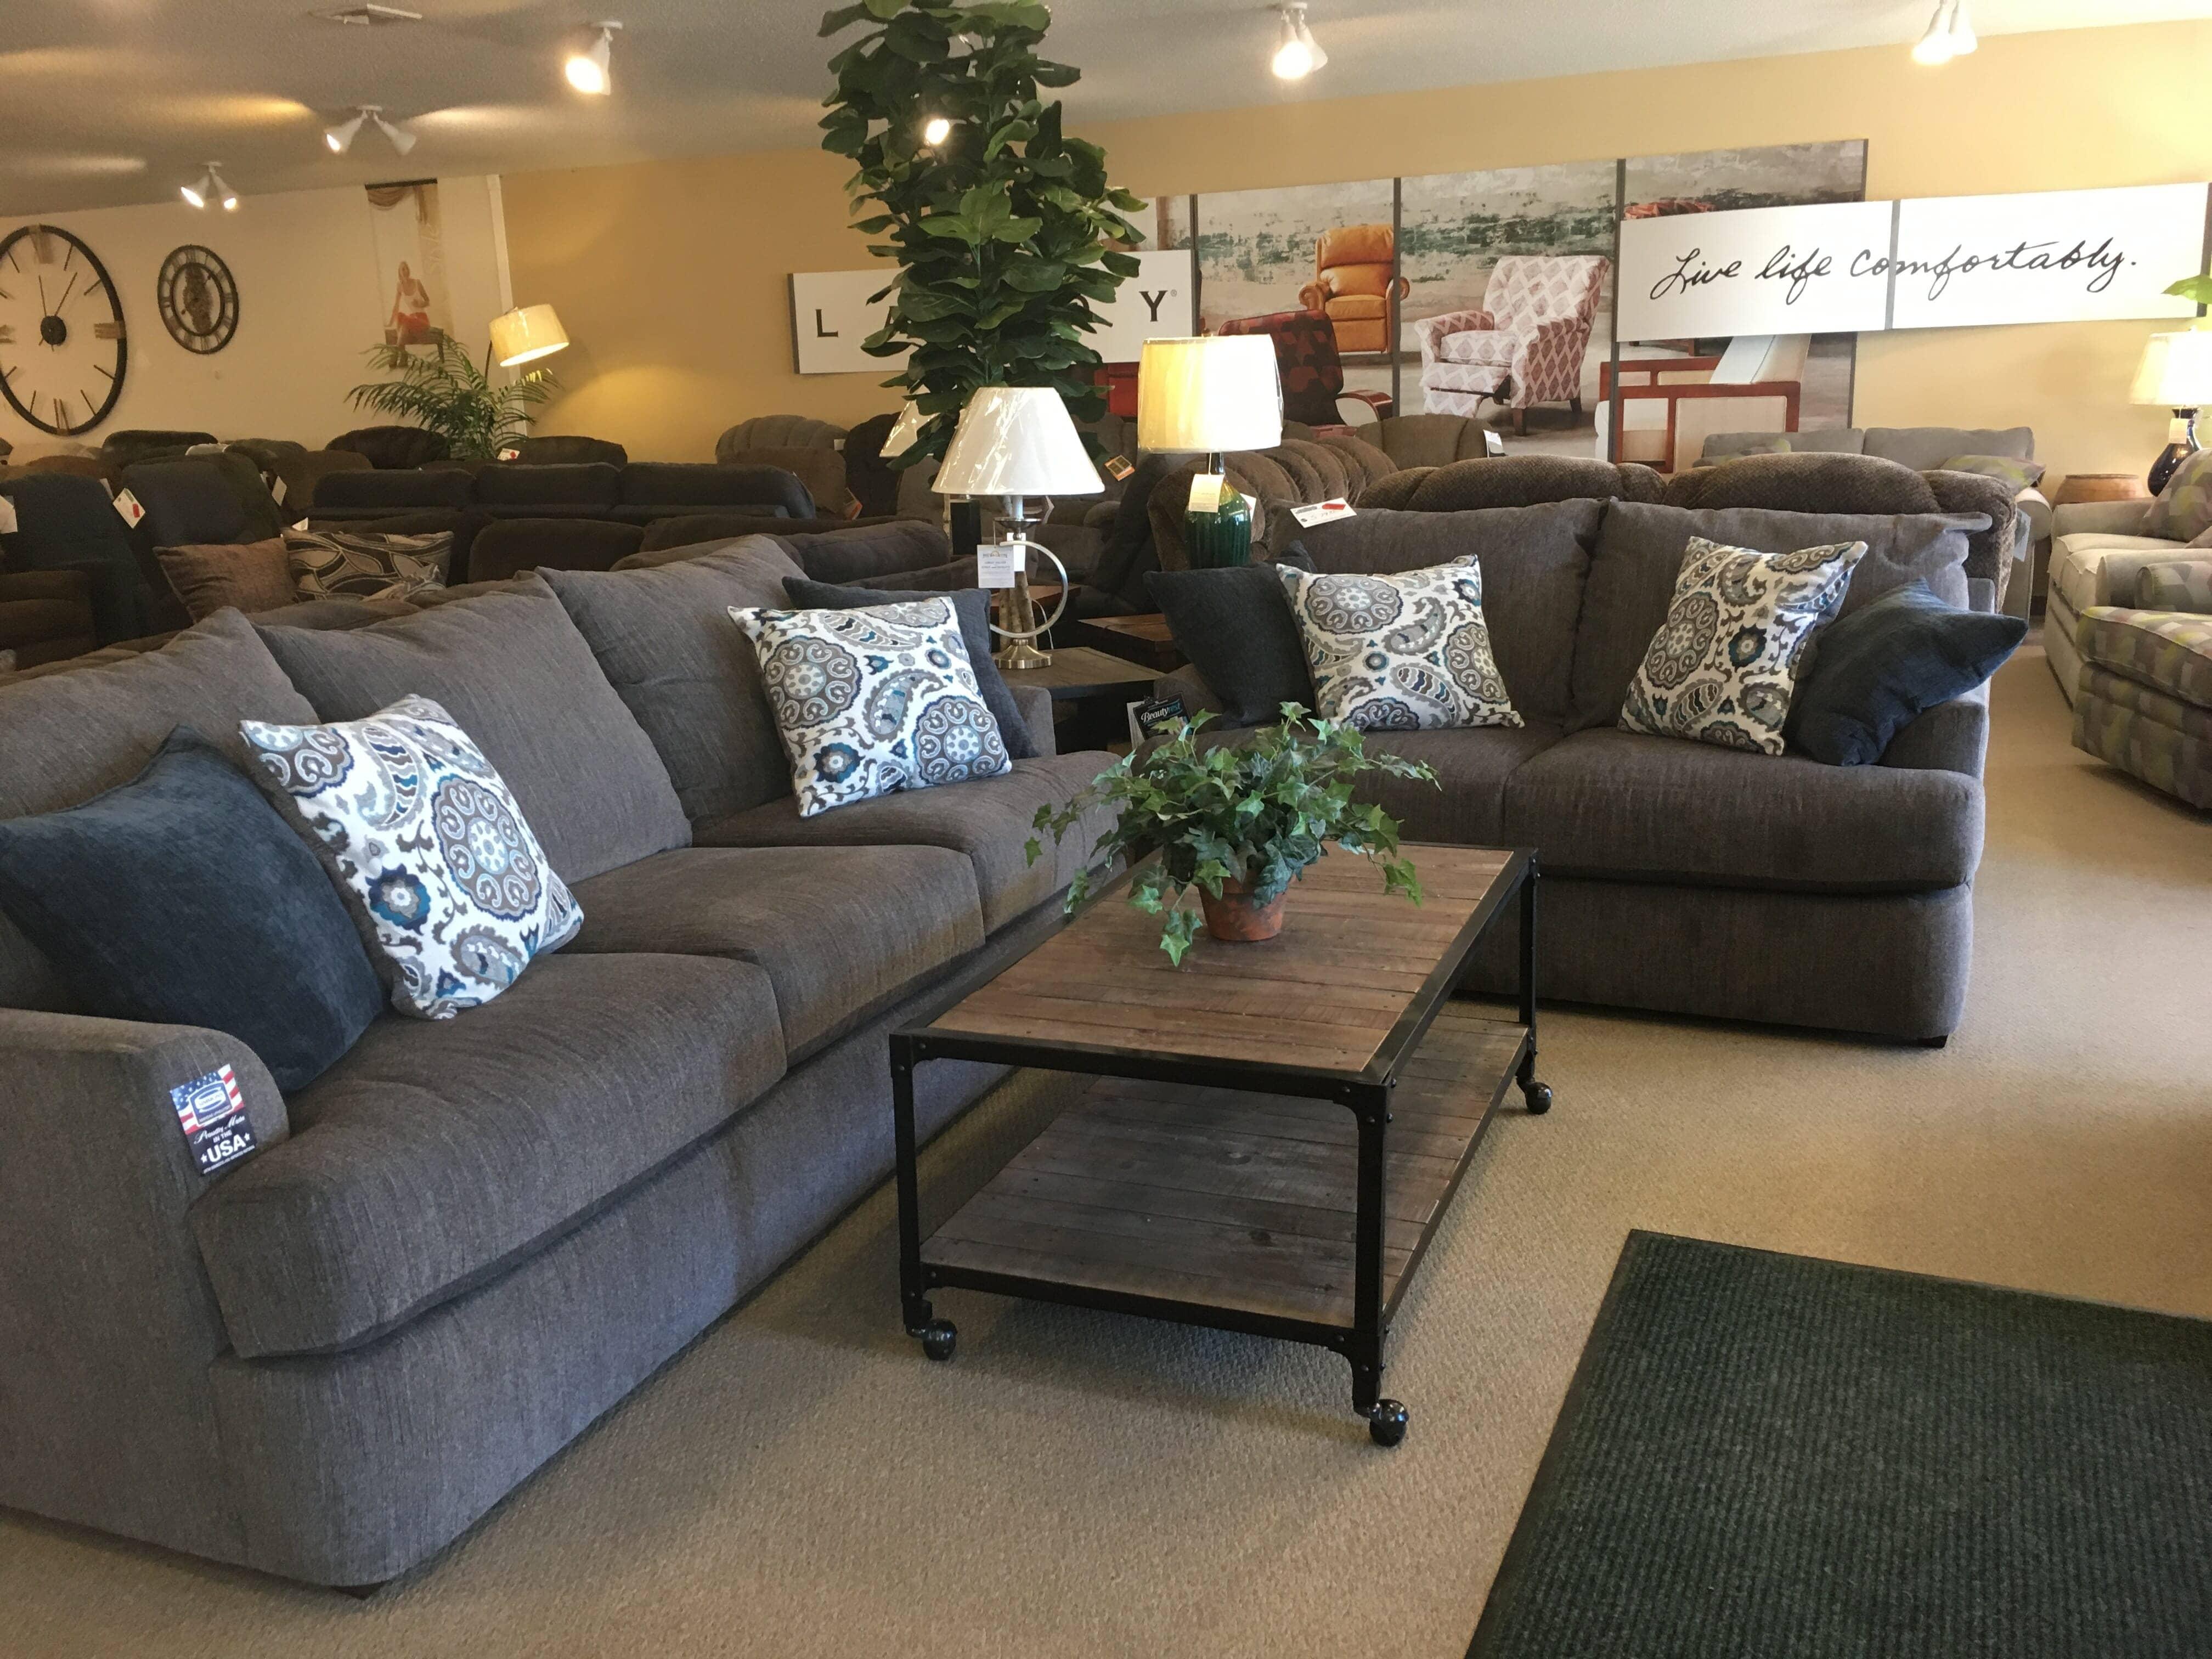 Jonathan's Furniture, Auburn, New York